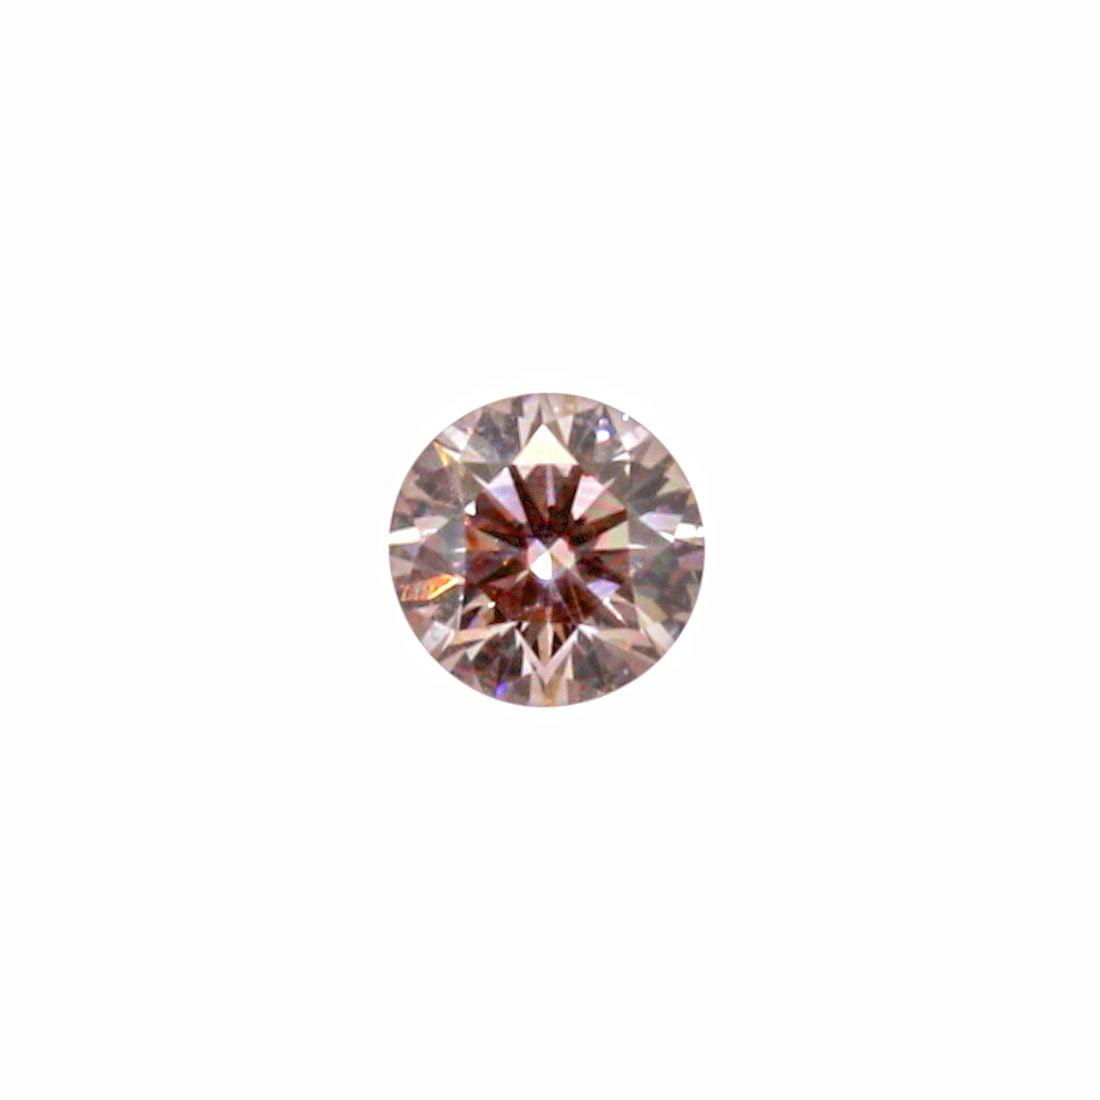 0.18ct Natural Fancy Light Pink, 7P Argyle Diamond